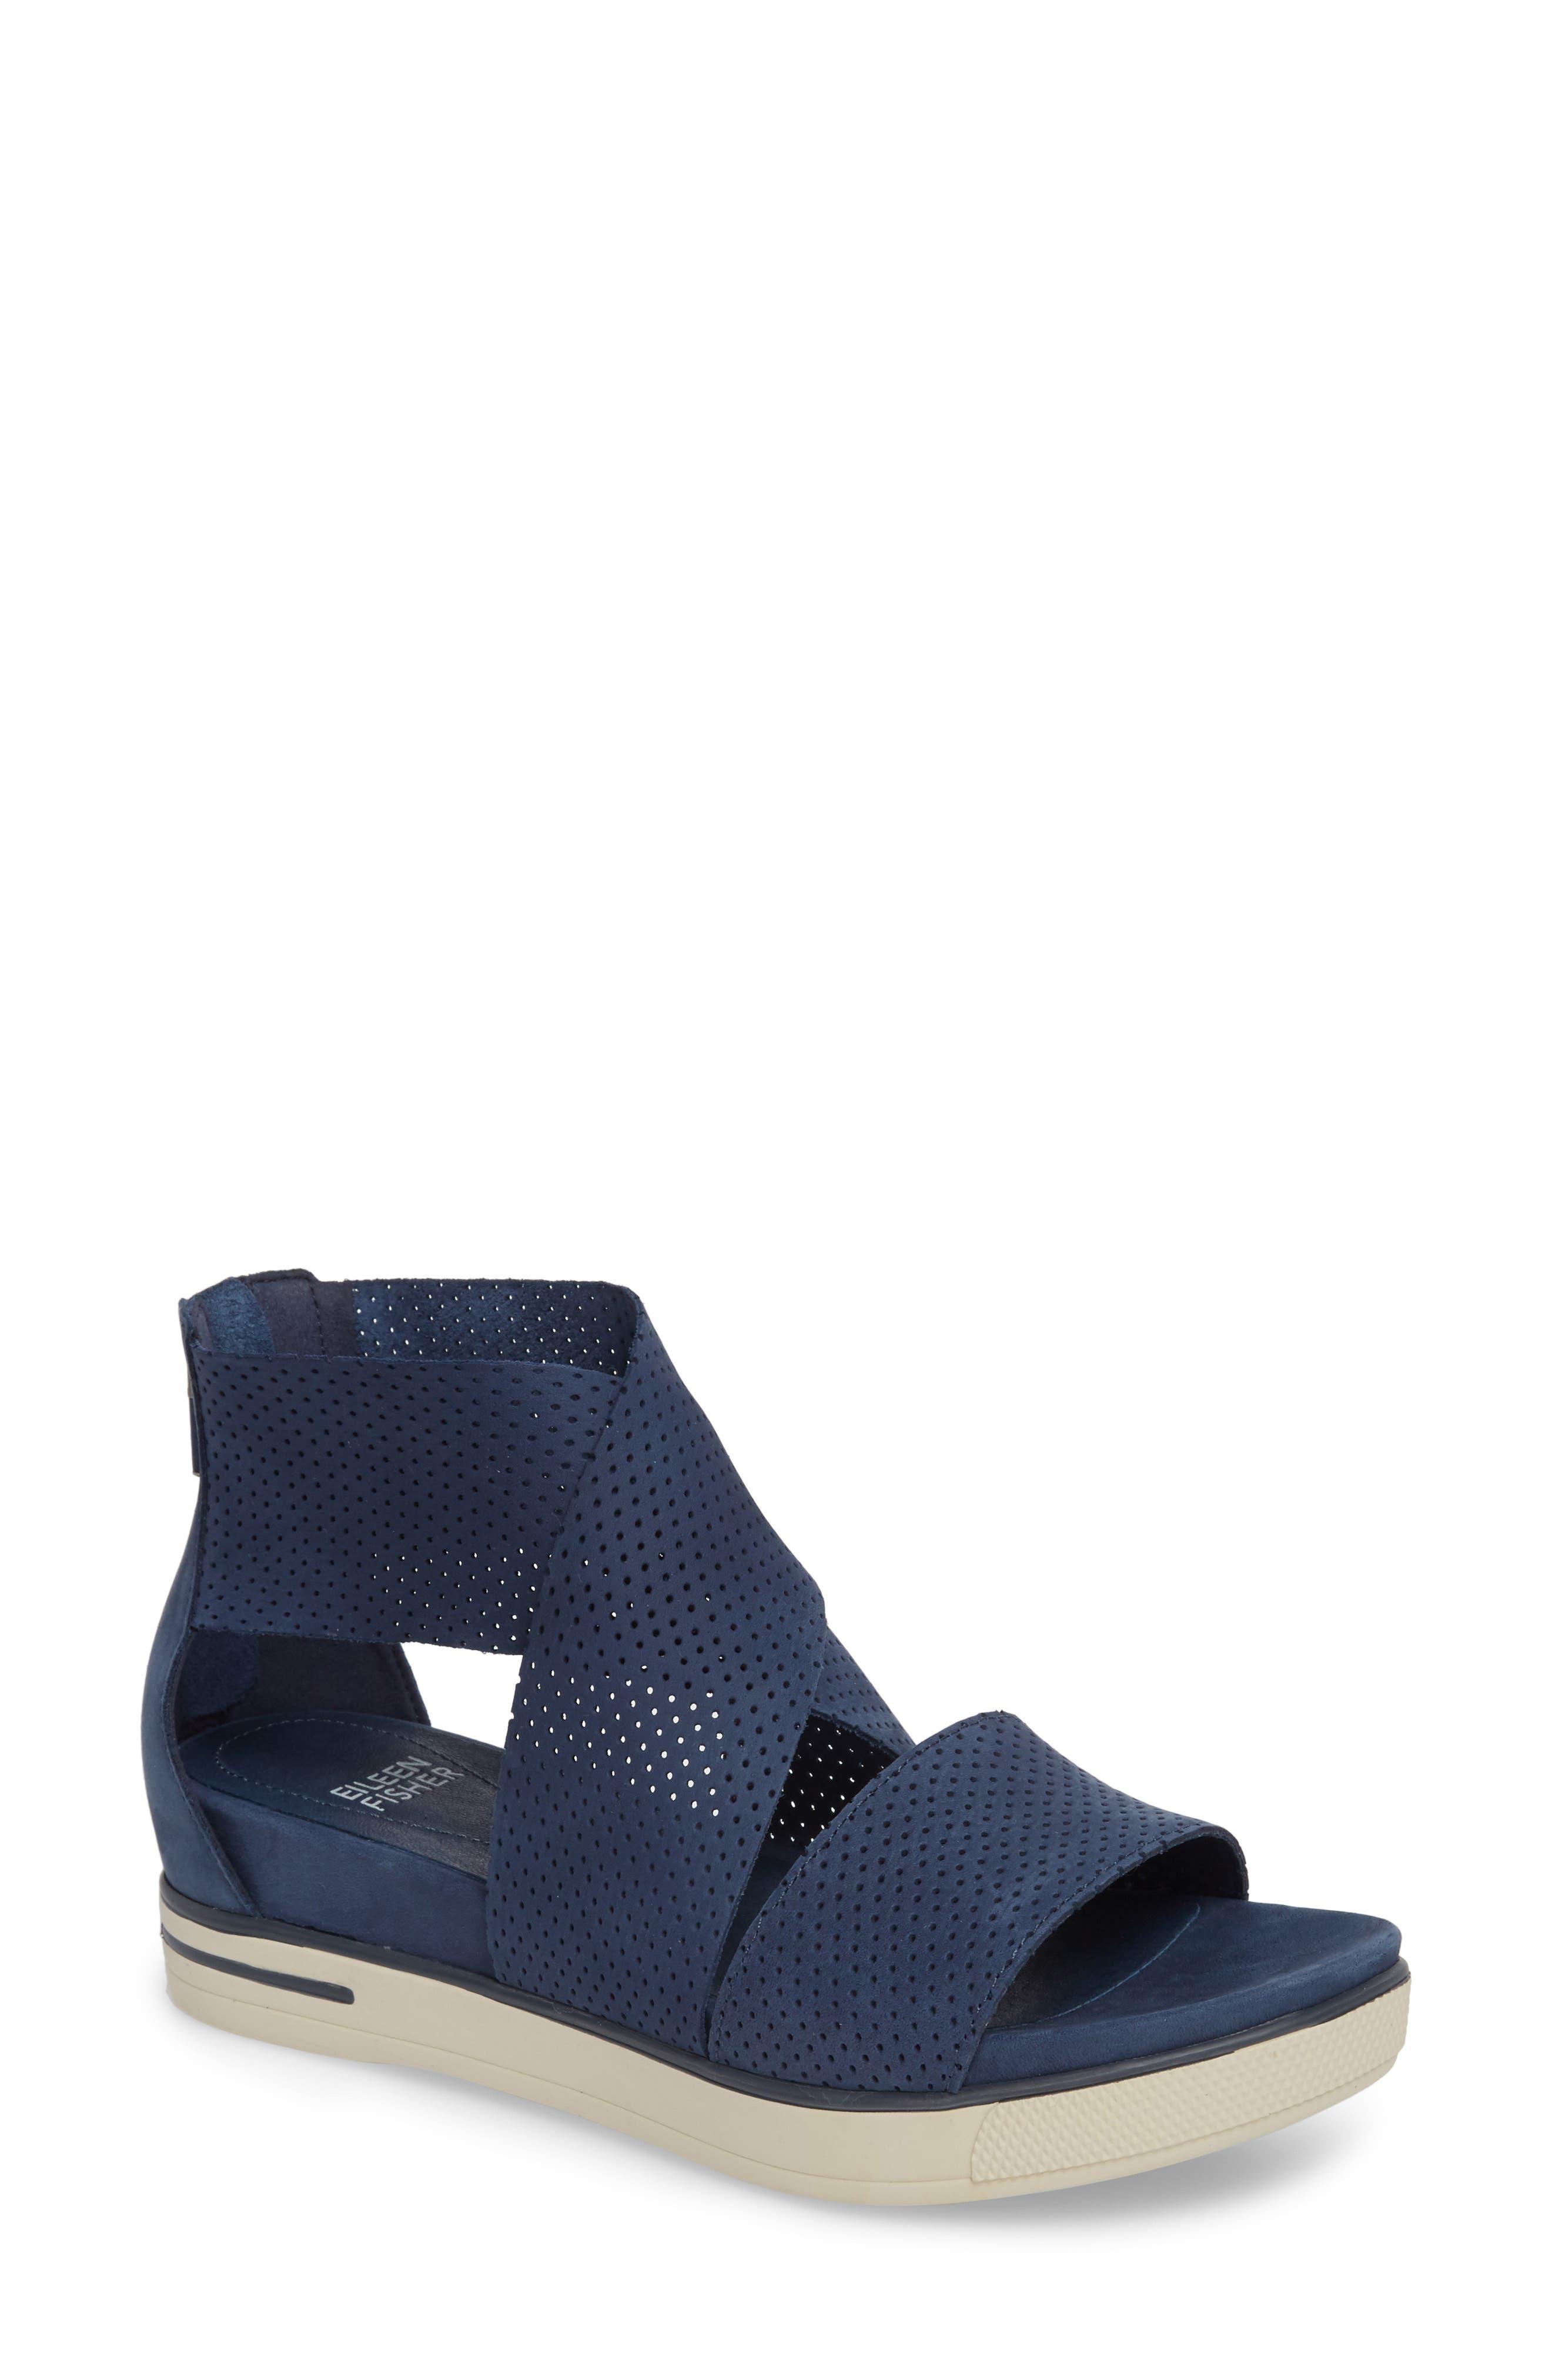 Sport Platform Sandal,                         Main,                         color, Denim Nubuck